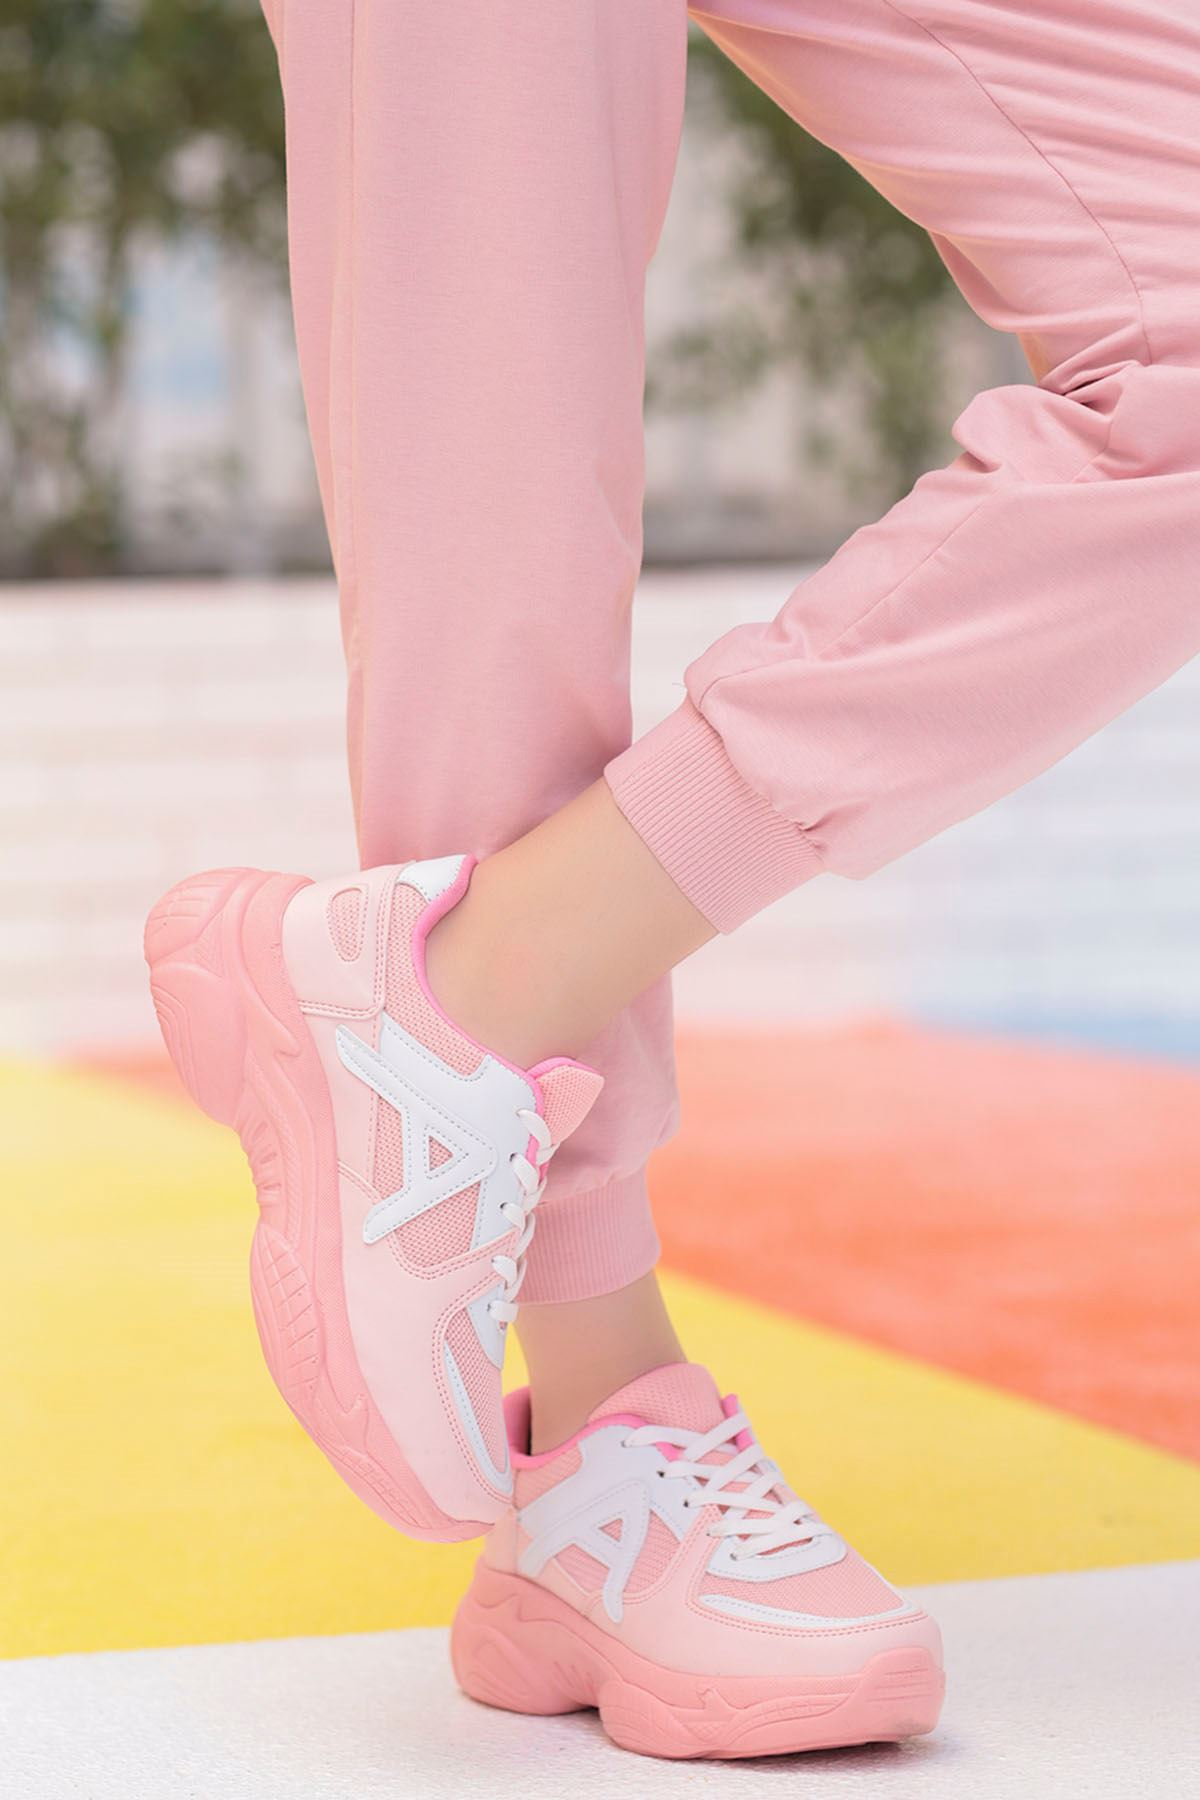 Afra A Detay Spor Ayakkabı Pudra Beyaz Detay